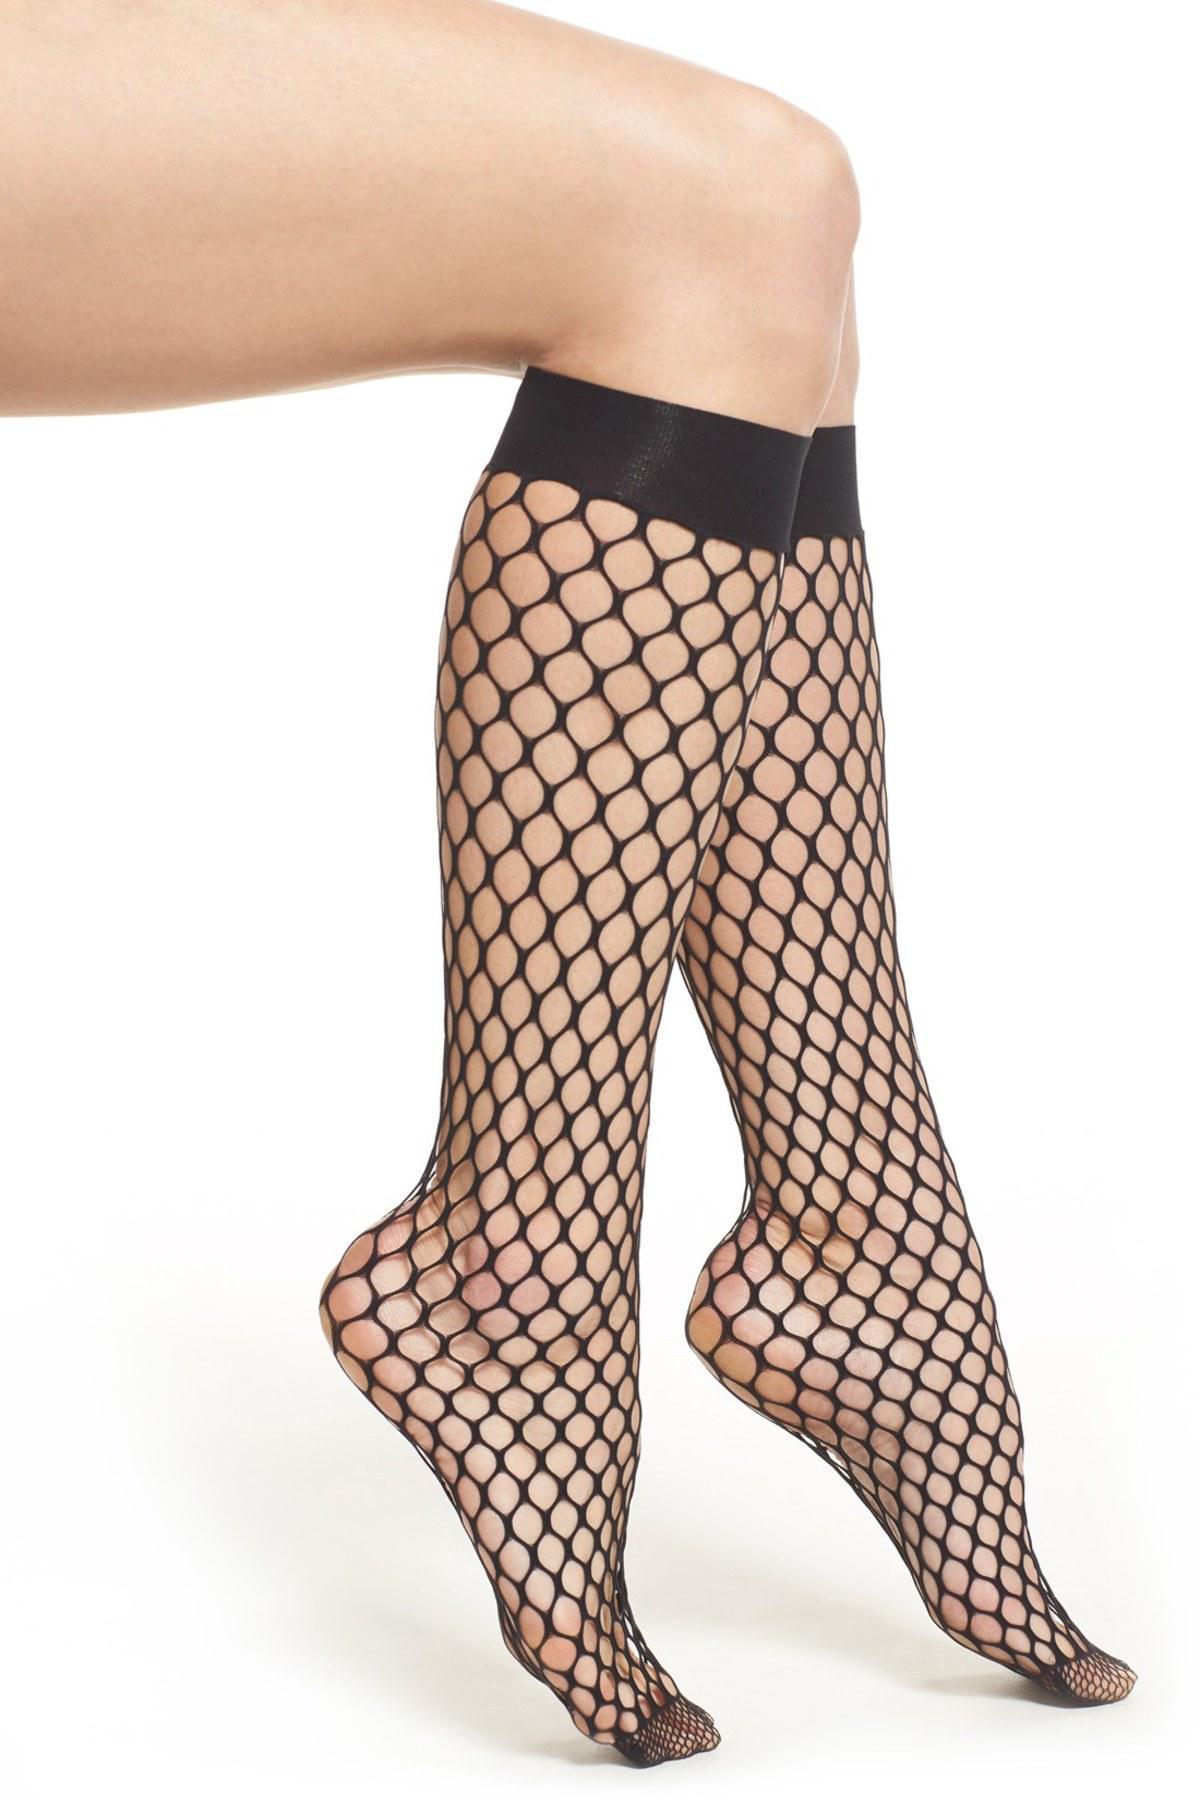 8341944e2f88a Wolford 'madeline' Fishnet Knee High Socks in Black - Lyst